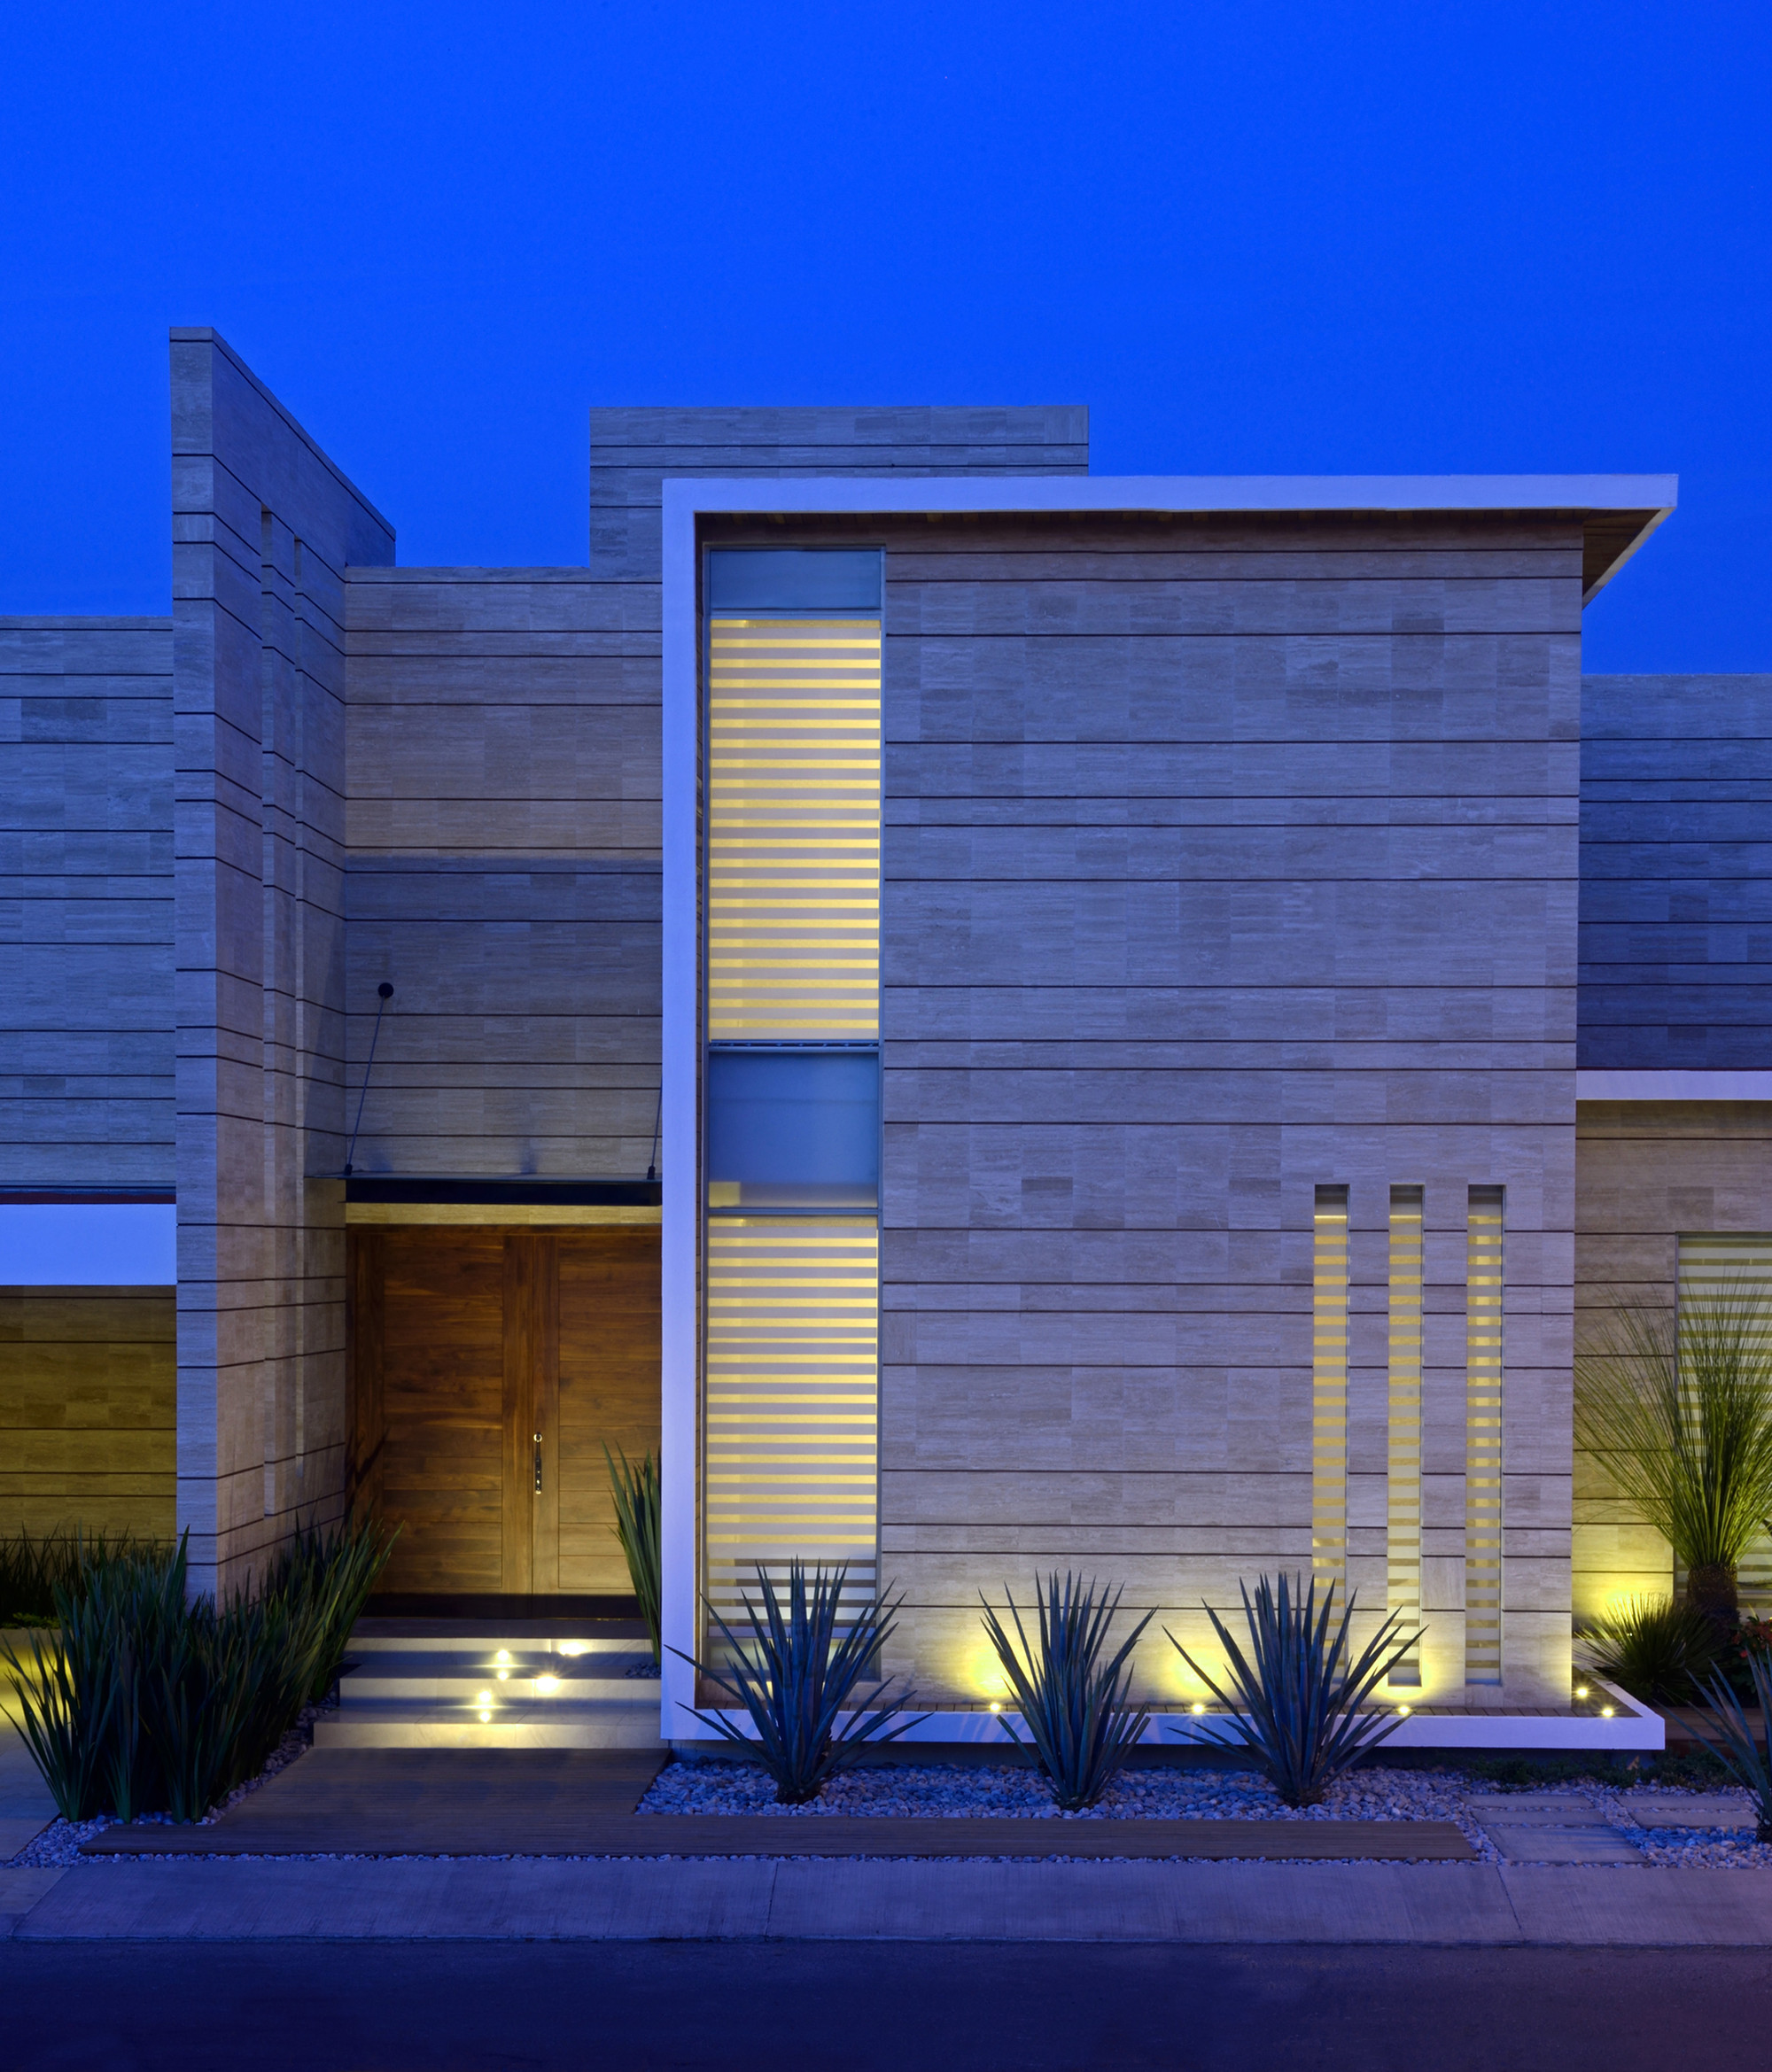 Galeria de casa navona ji studio 13 for Galerias casas minimalistas